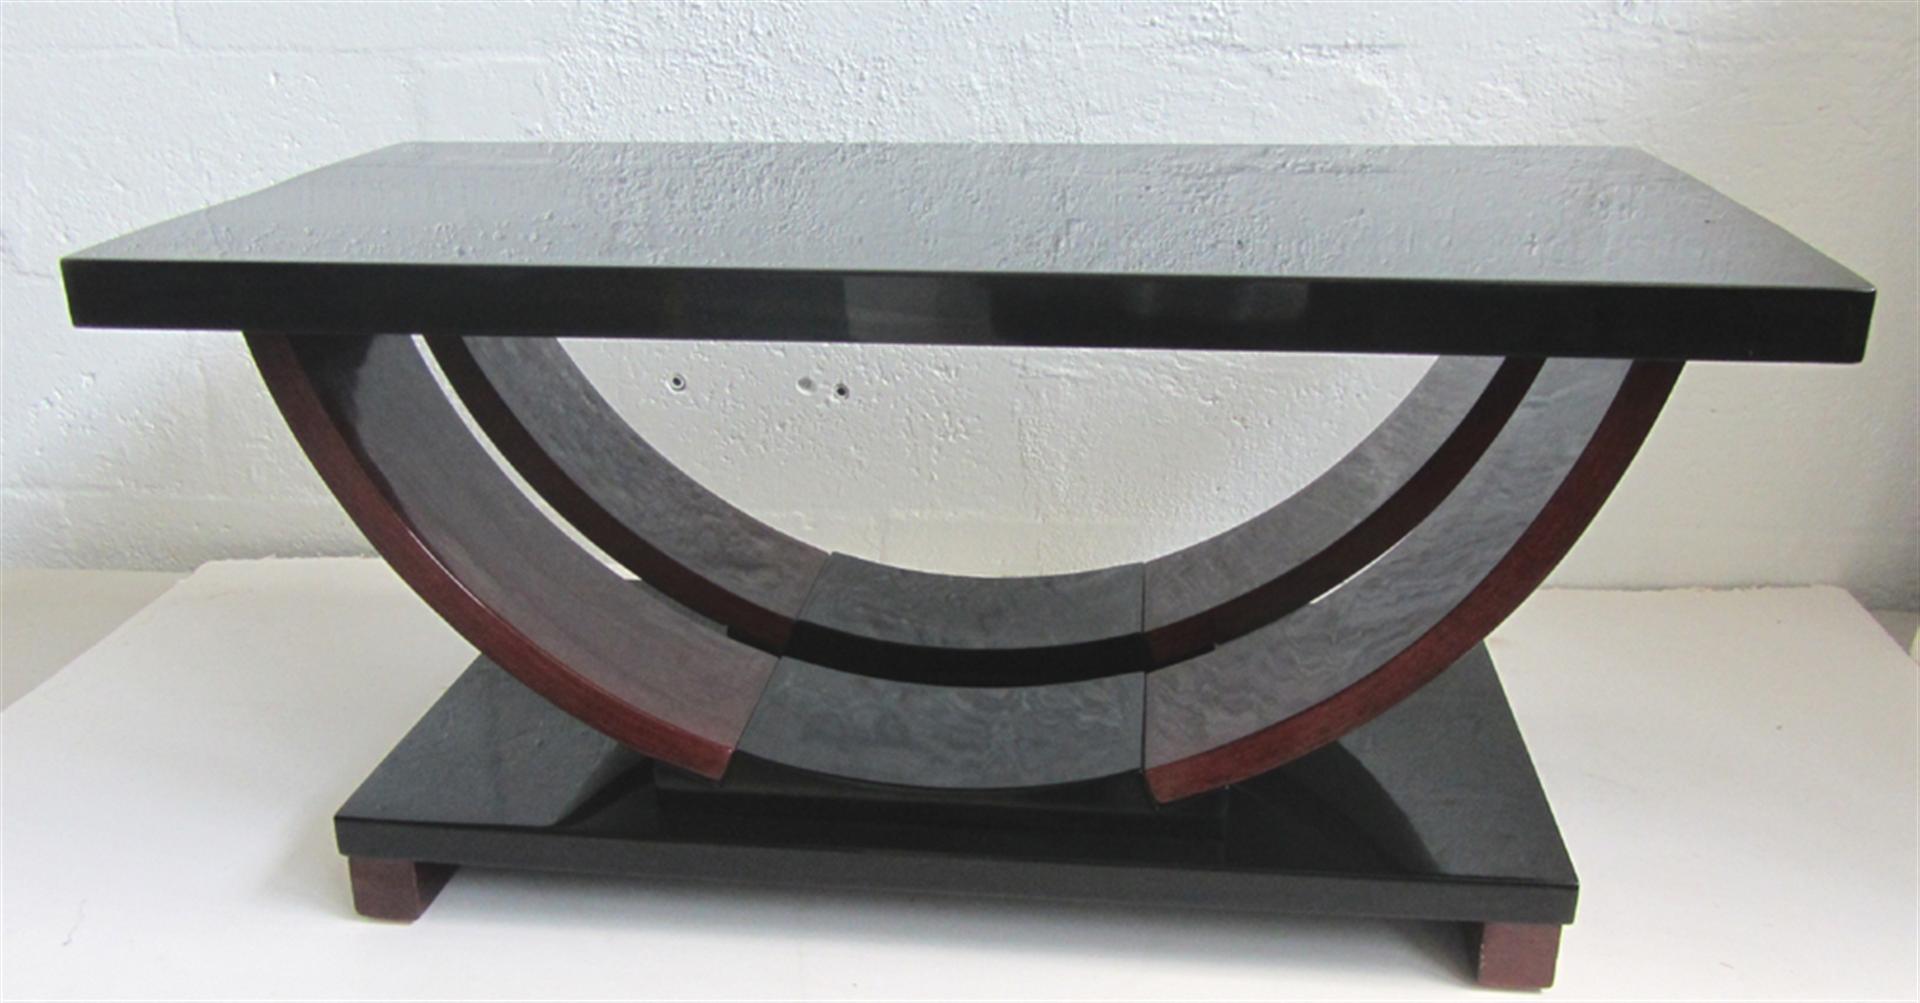 Modernage American Art Deco Streamline Design Coffee Table